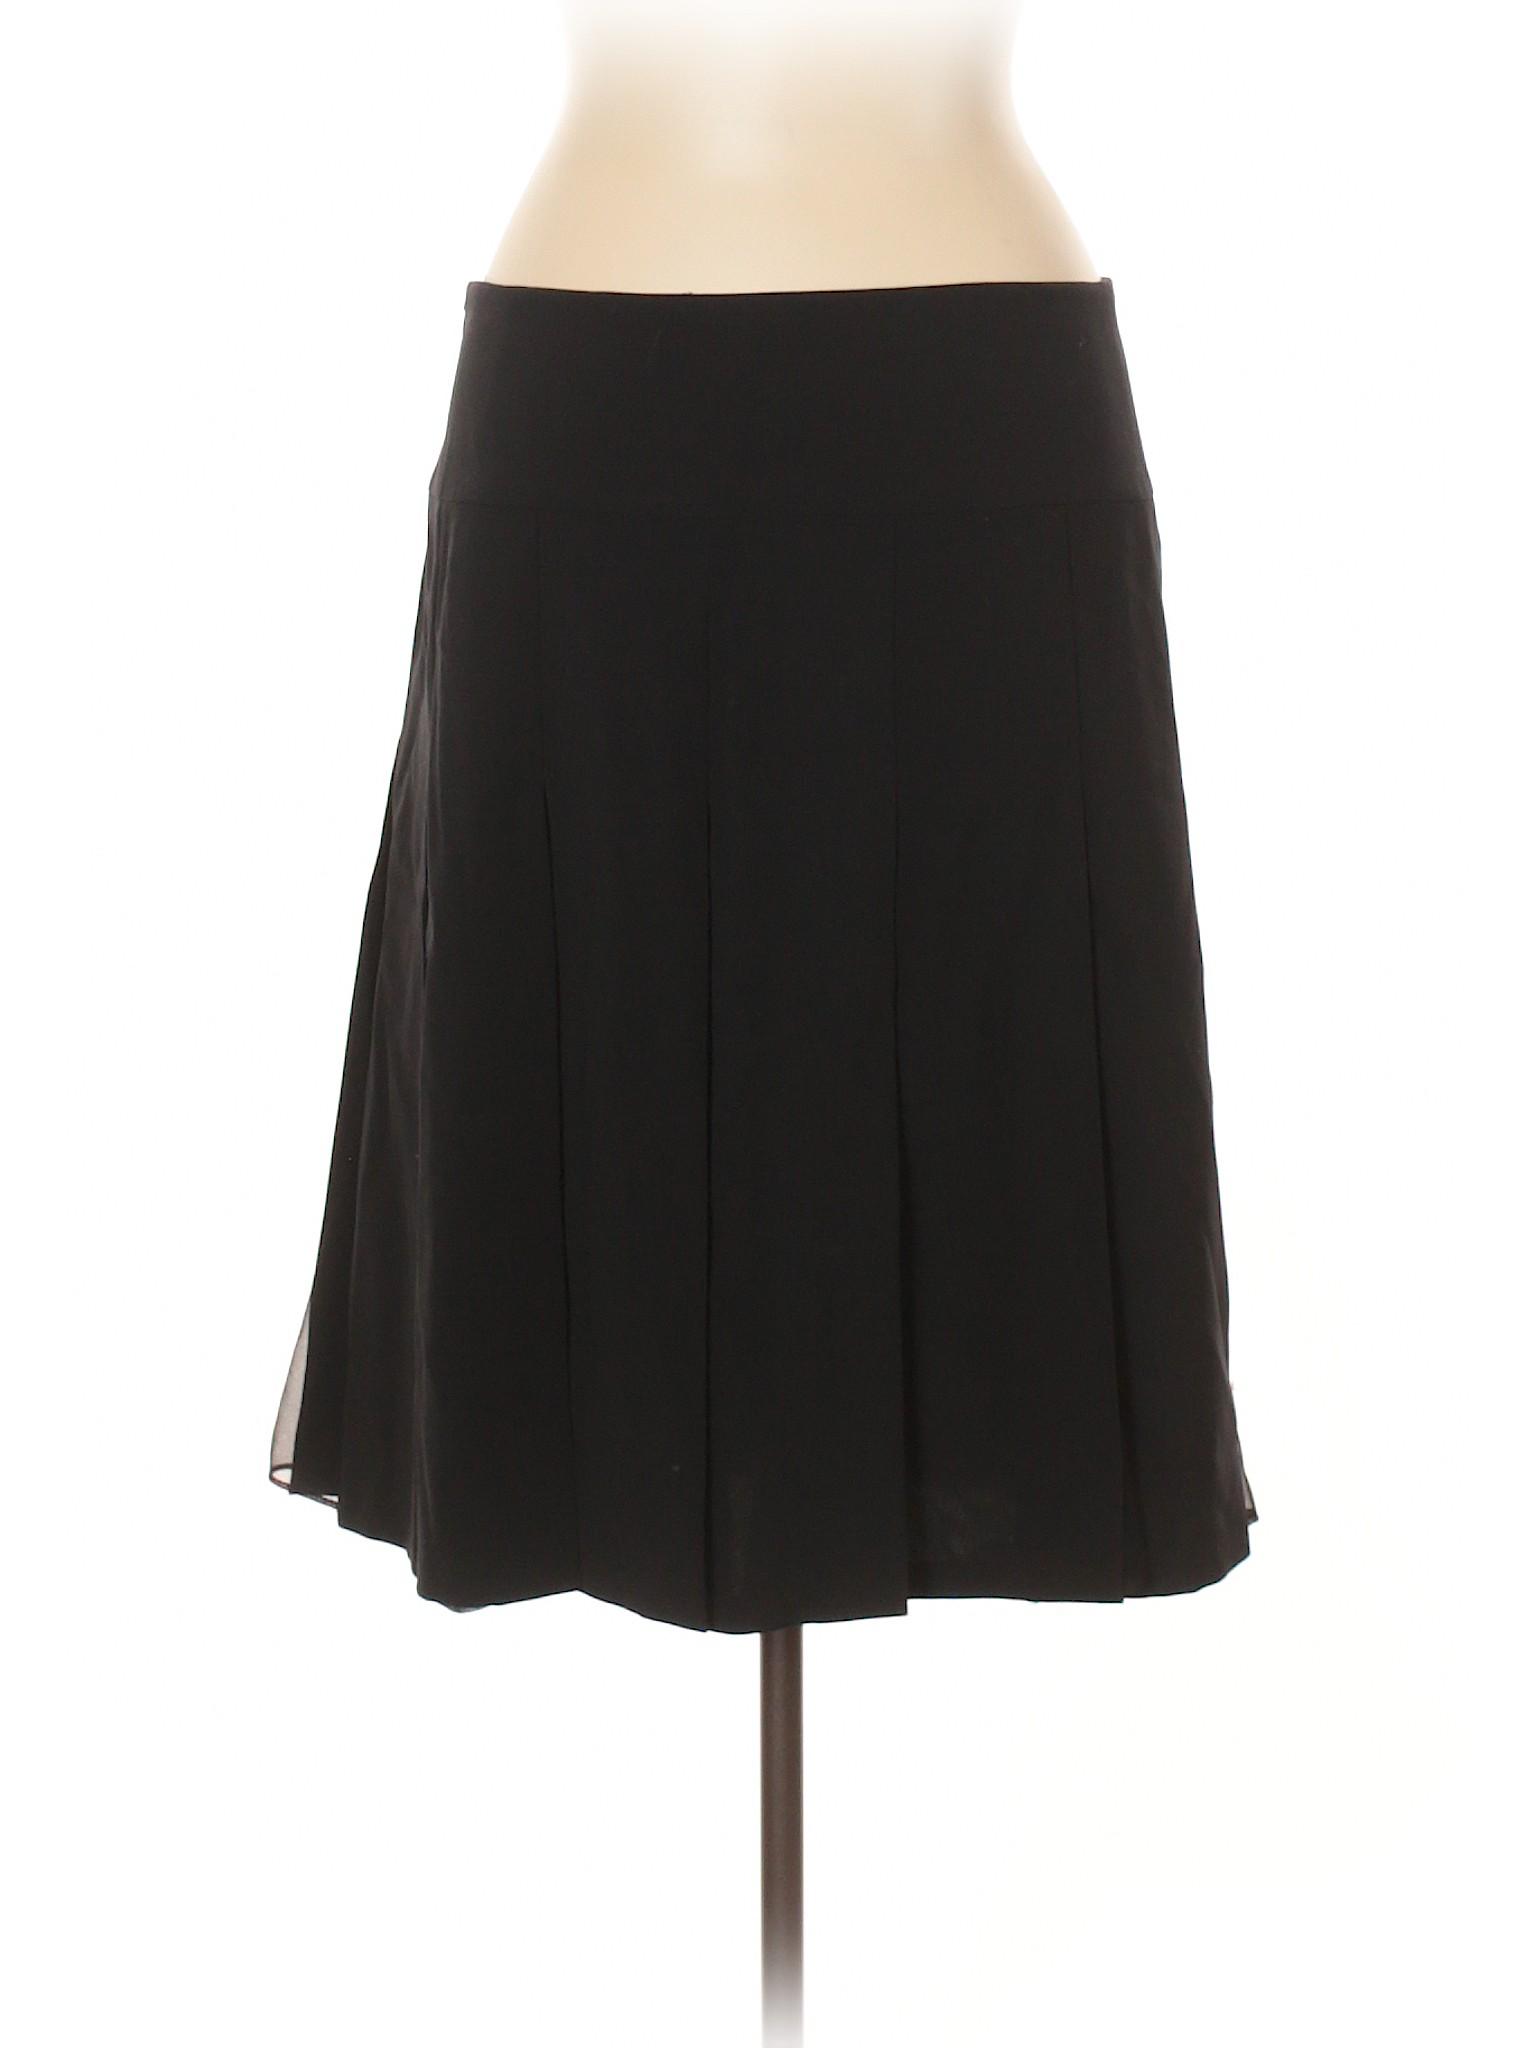 Boutique Skirt Boutique Wool Boutique Skirt Boutique Wool Wool Boutique Wool Skirt Wool Skirt 11TZWqr5B